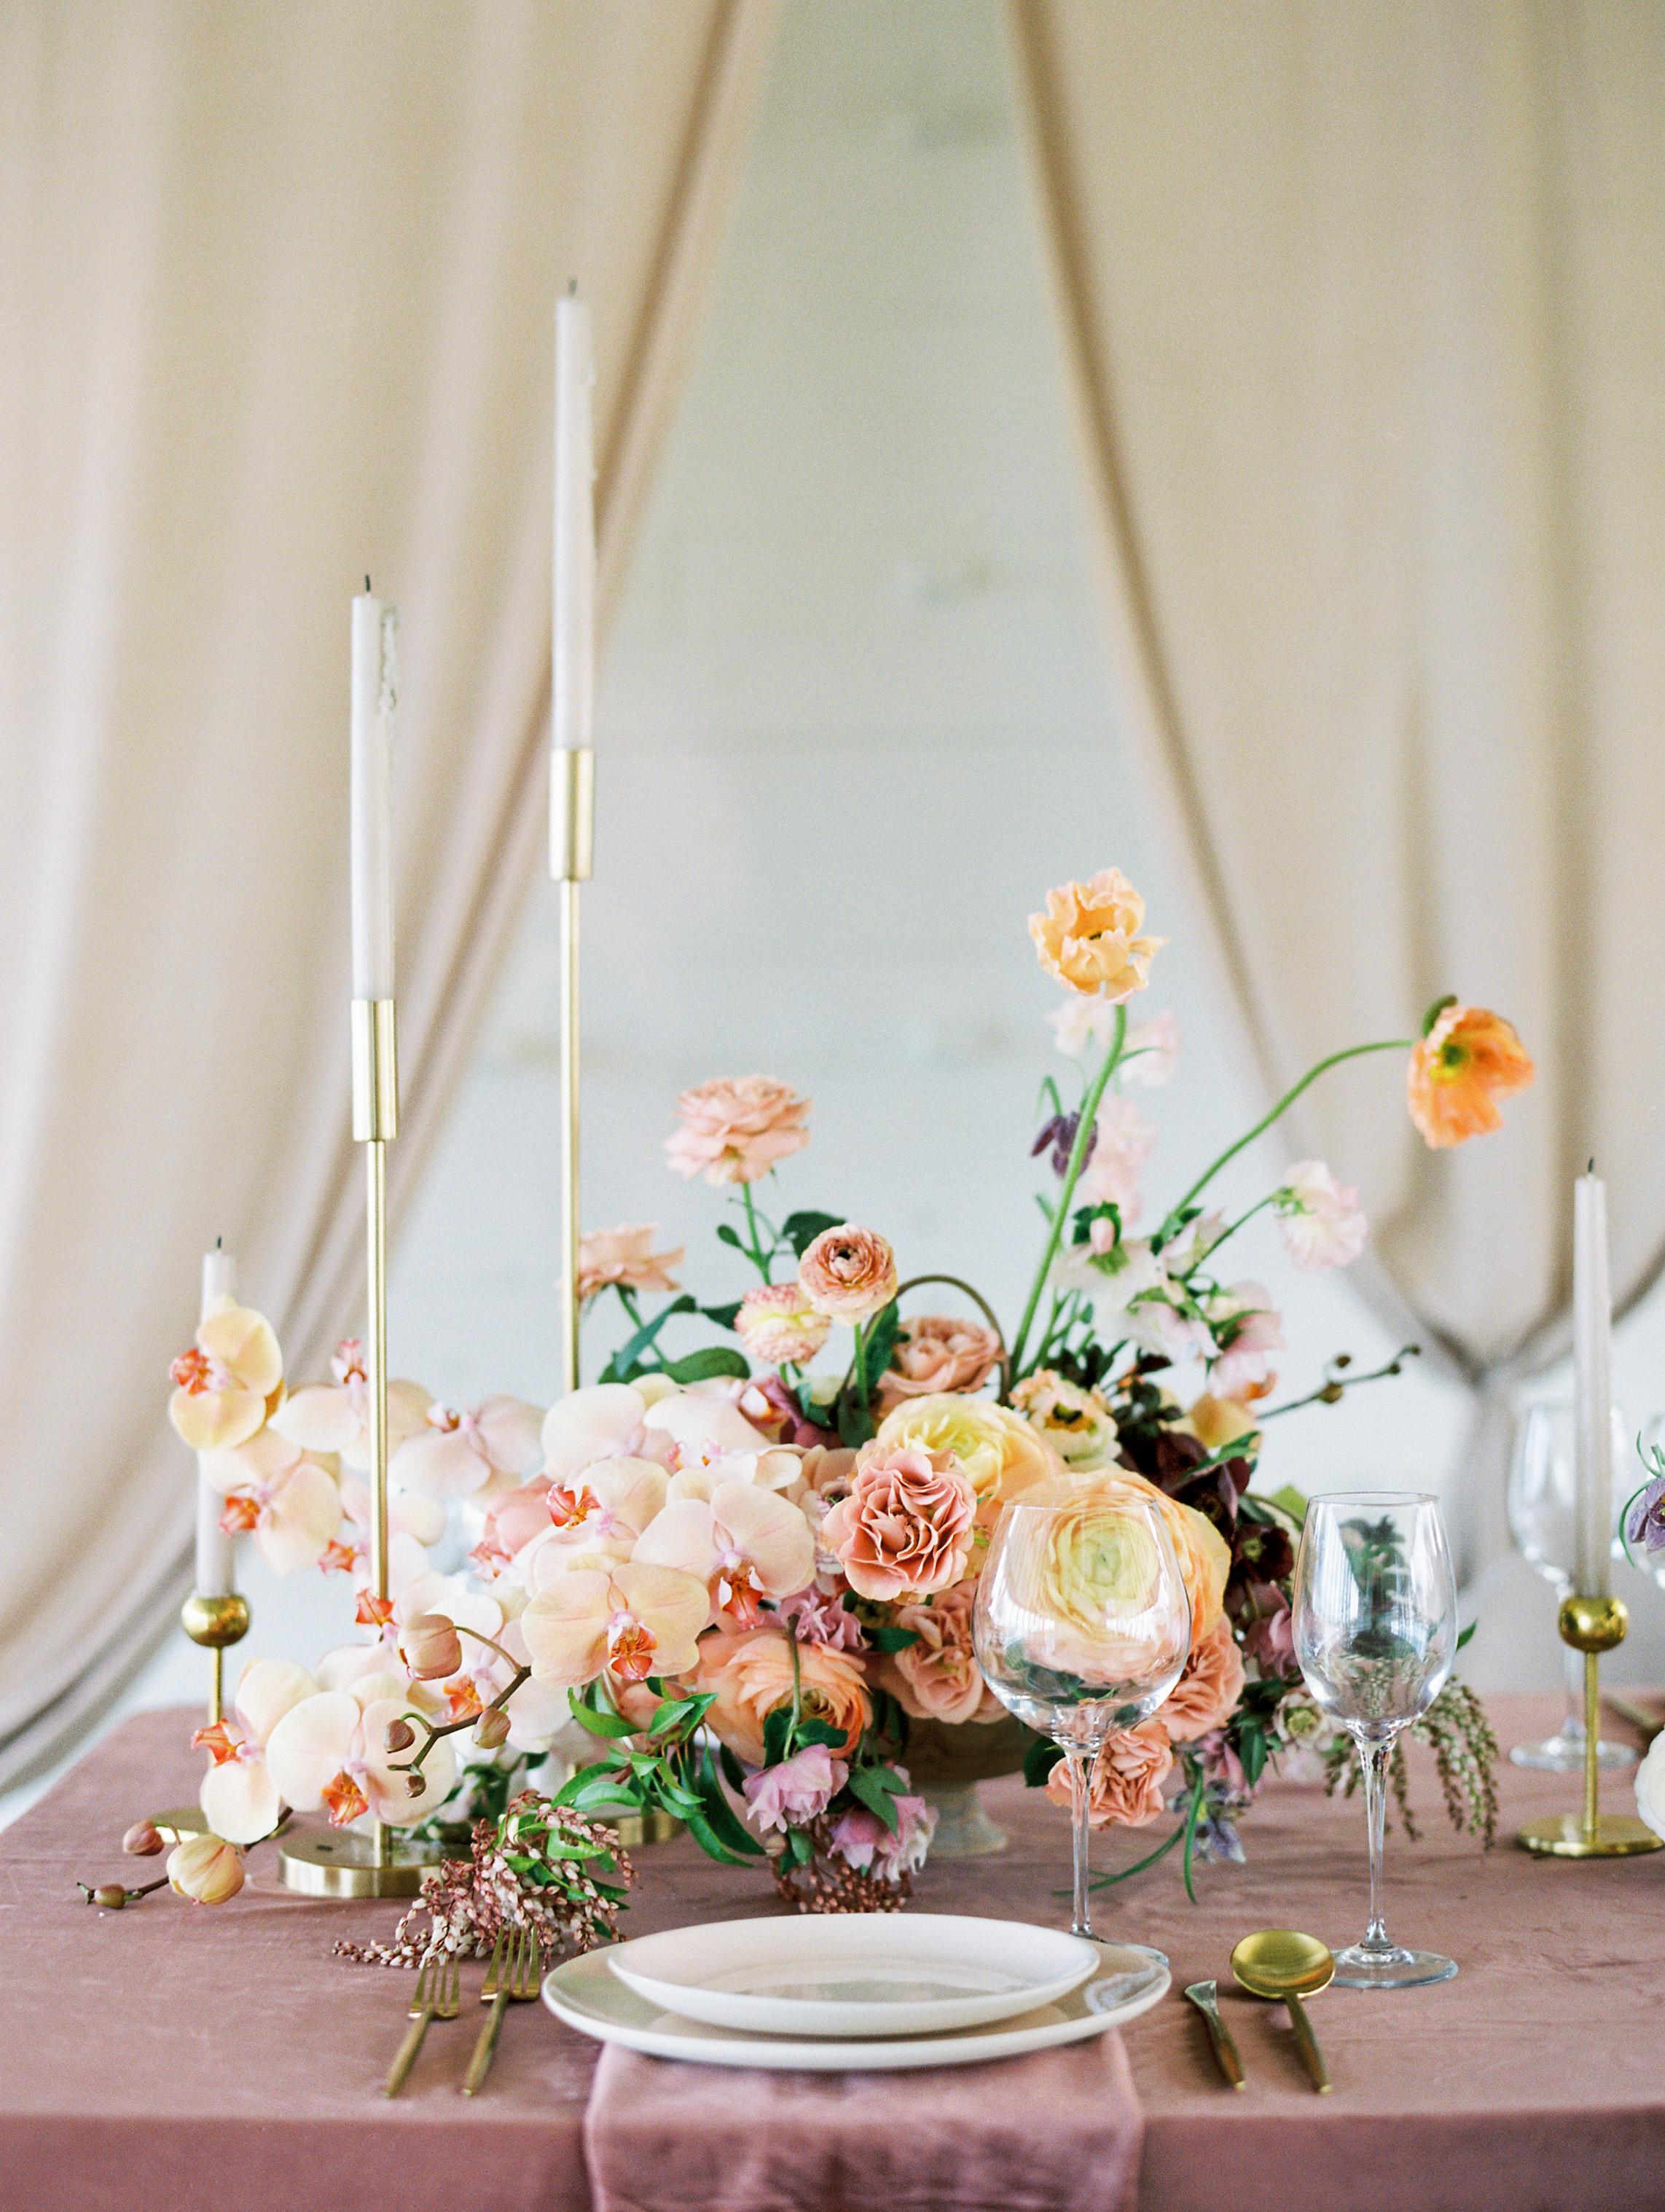 Austin-Wedding-Photography-Prospect-House-Fine-Art-Film-Destination-Dana-Josh-Fernandez-Photography-Dallas-Houston-Luxury-Best-Top-16.jpg